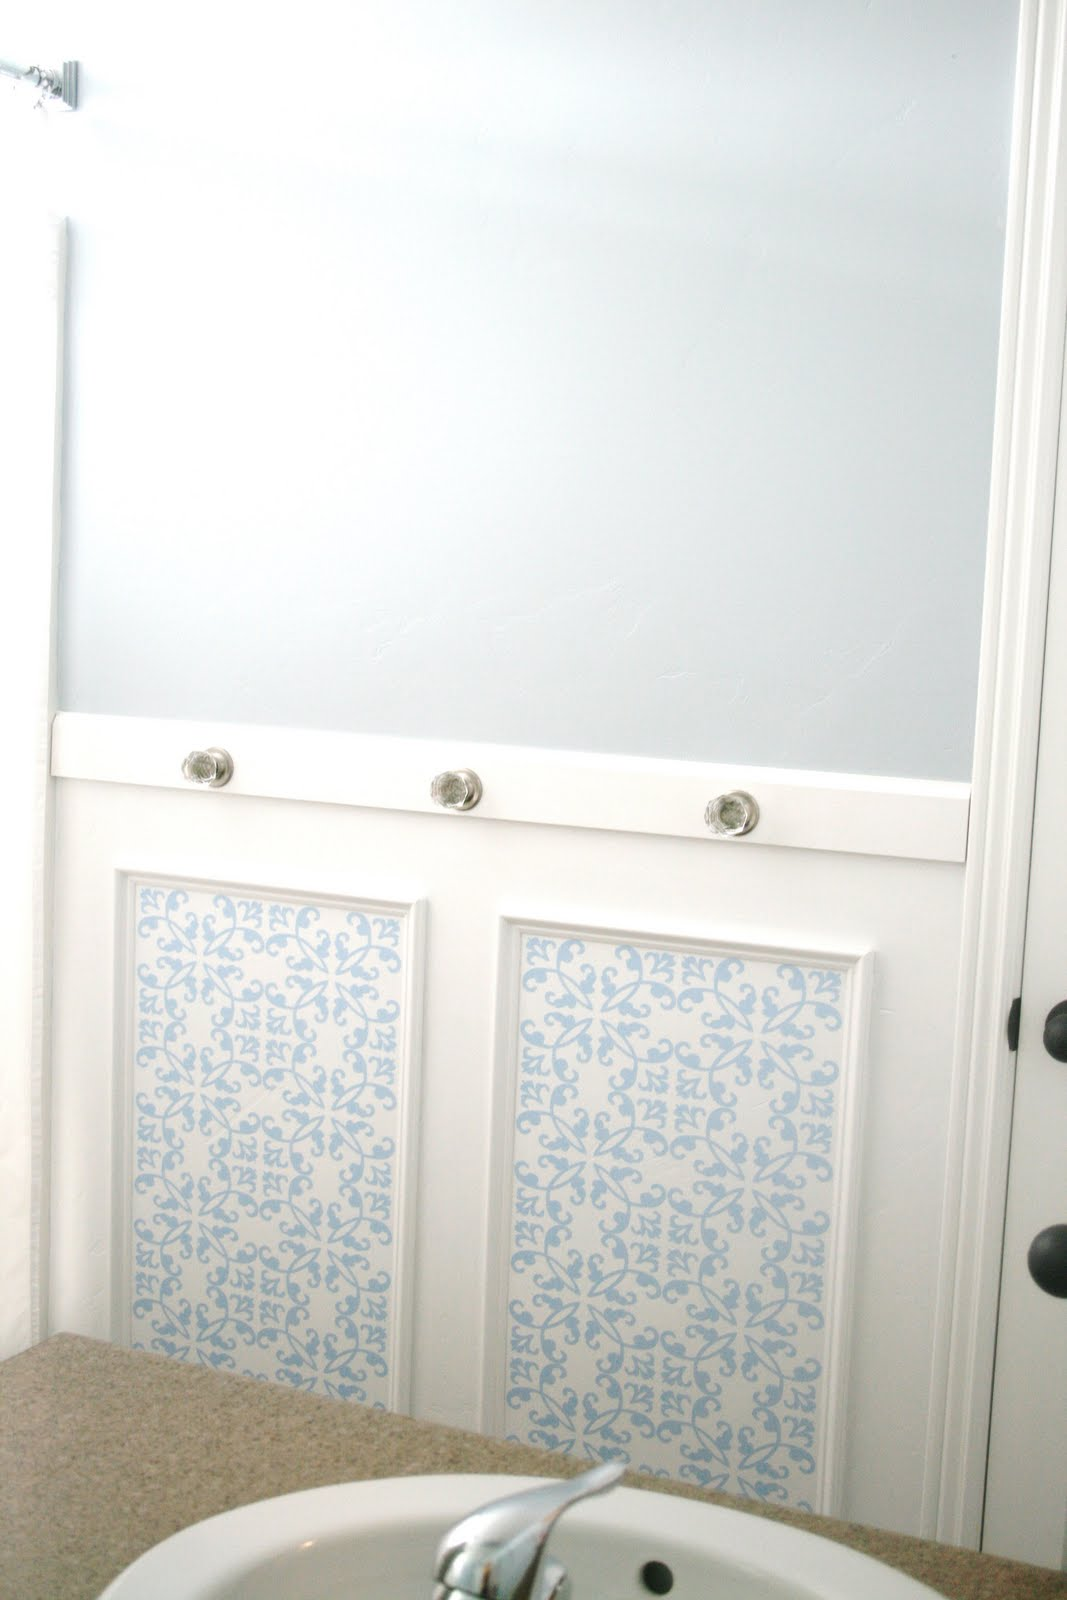 Chic Bathroom Wall Treatment Tutorial